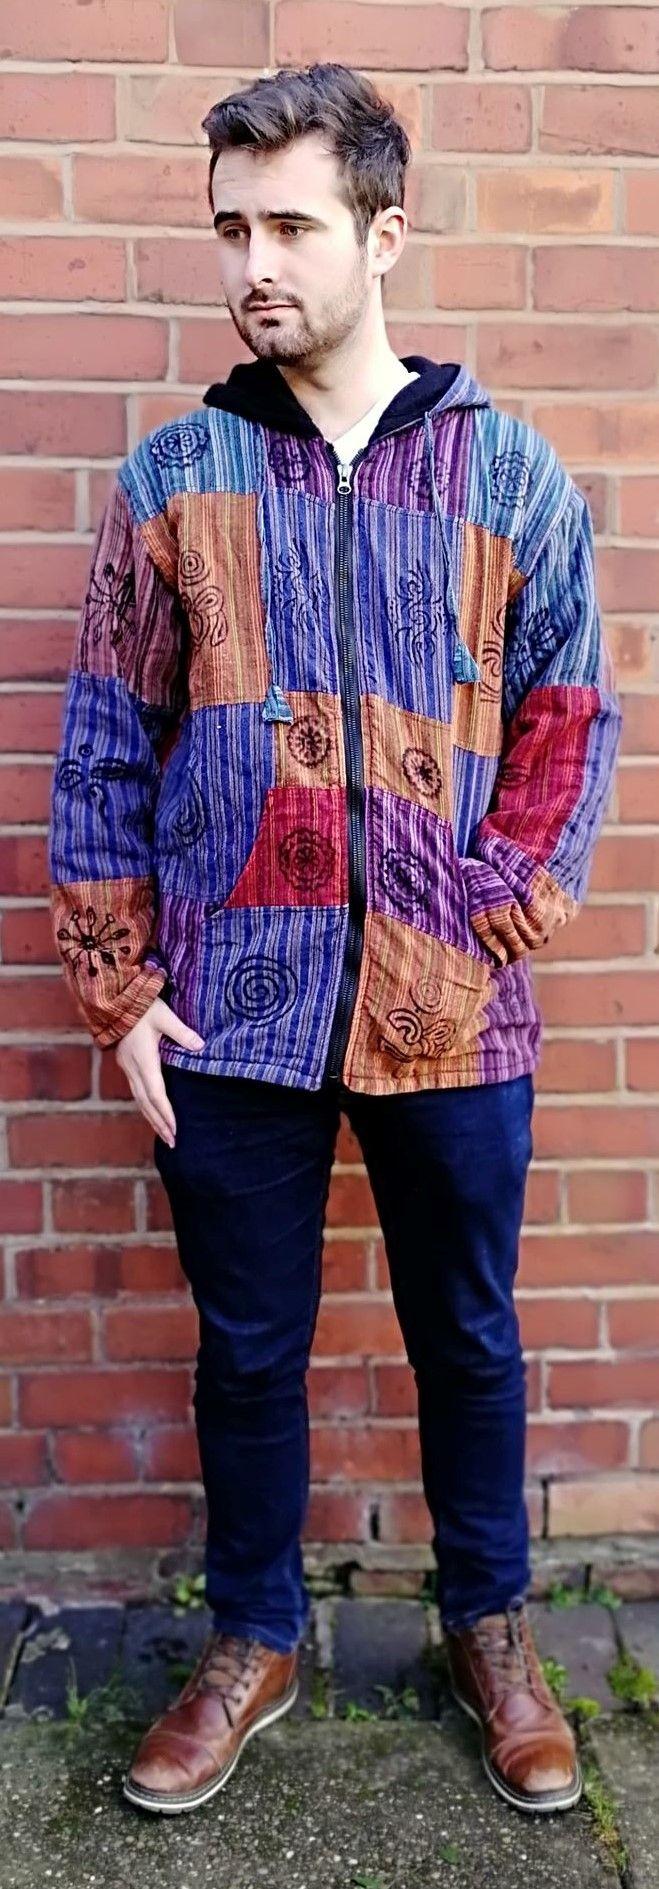 *Cotton patchwork fleece lined jacket